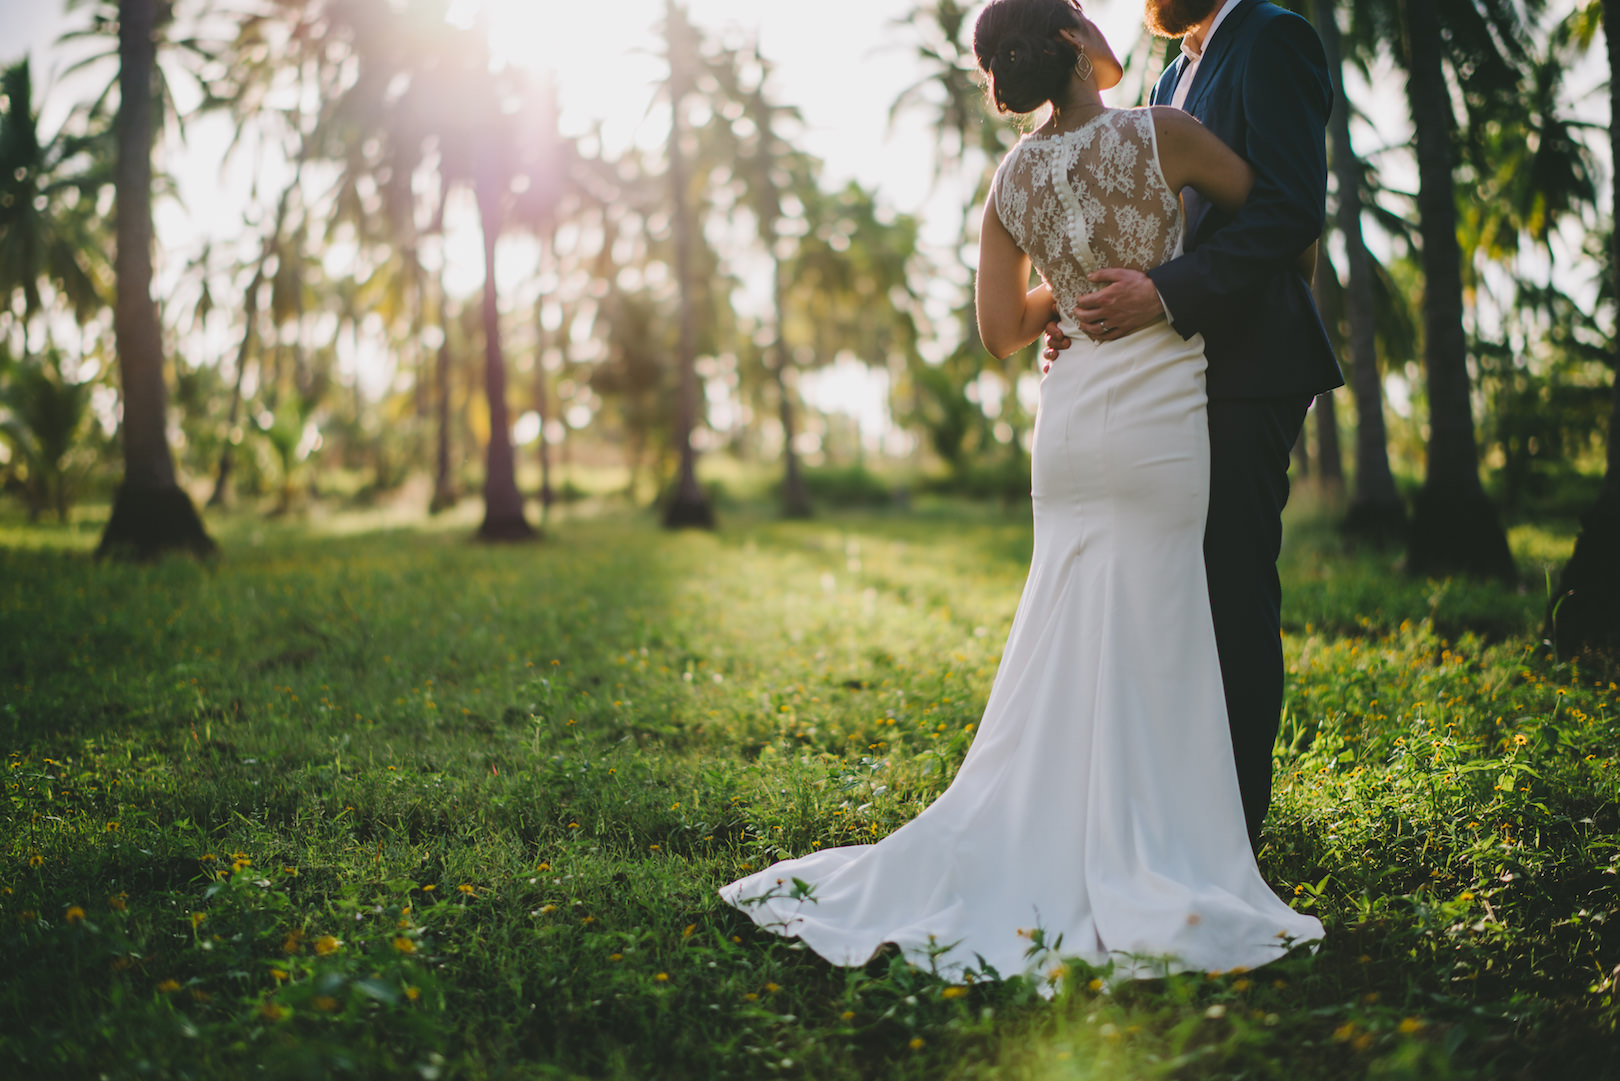 Nathan & Felicia - Wedding Day - © Dallas Kolotylo Photography - 482